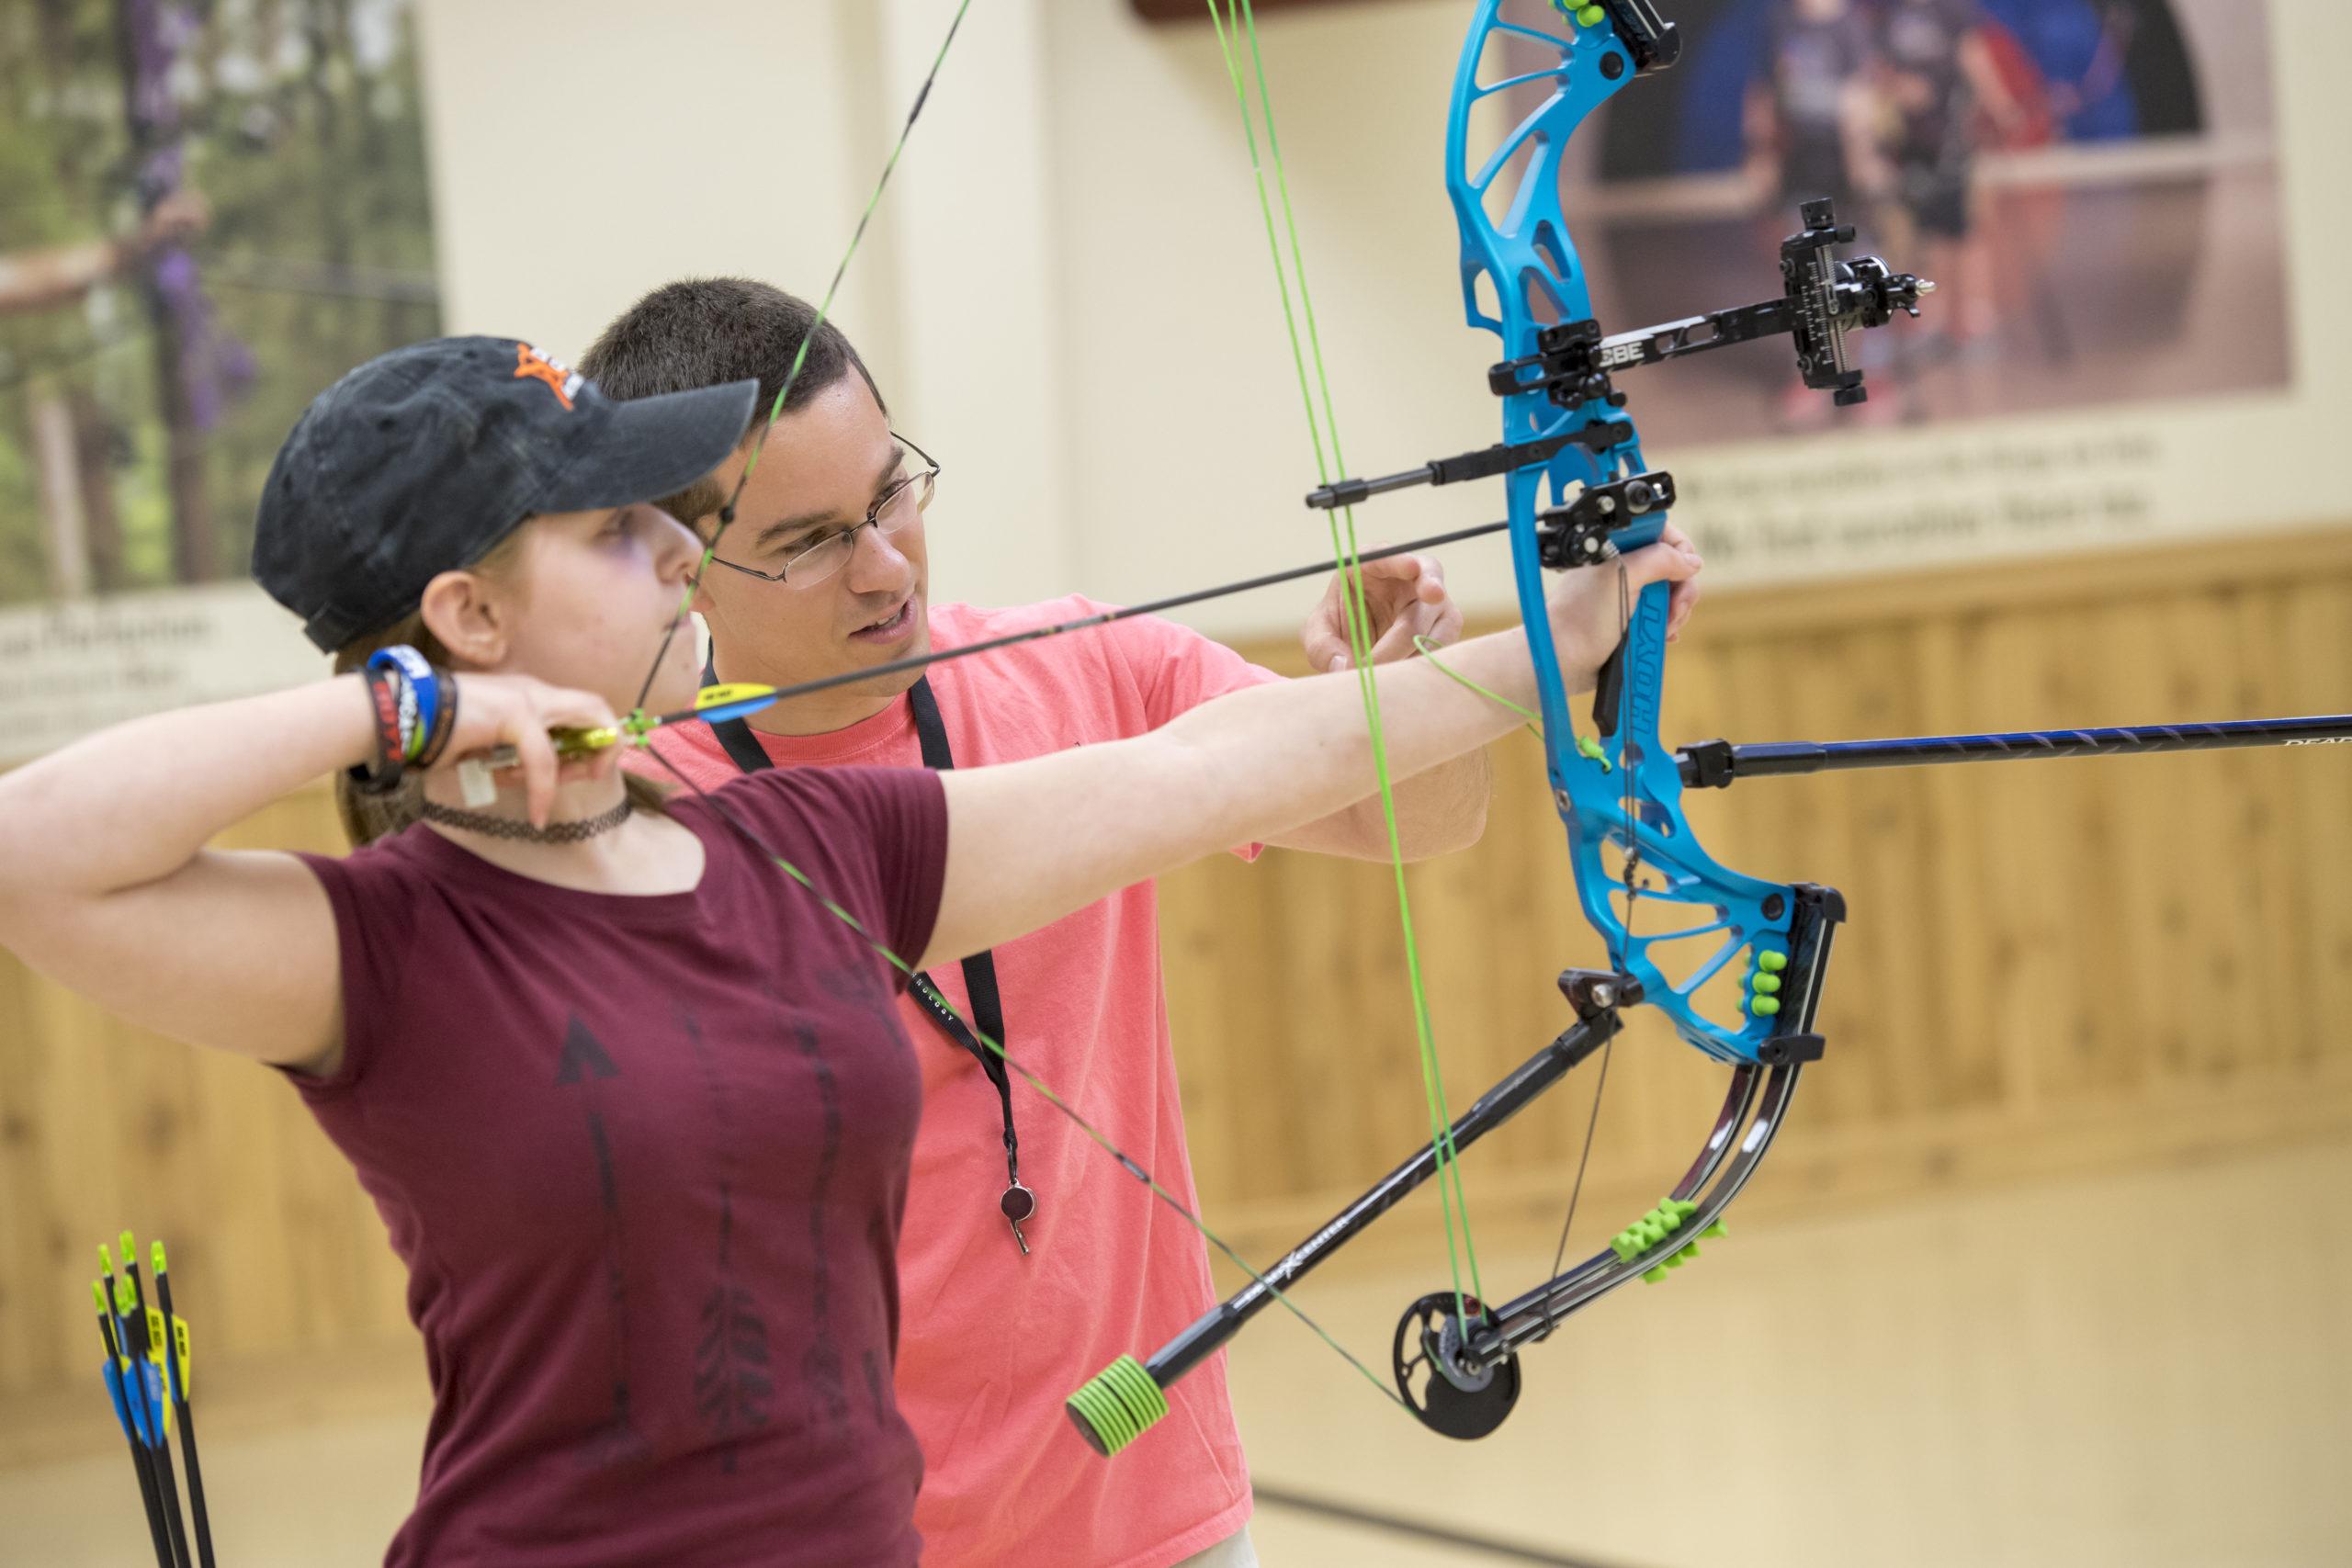 Archery, Hunting, Matthew Lester Photography, Outdoor Recreation, Pennsylvania